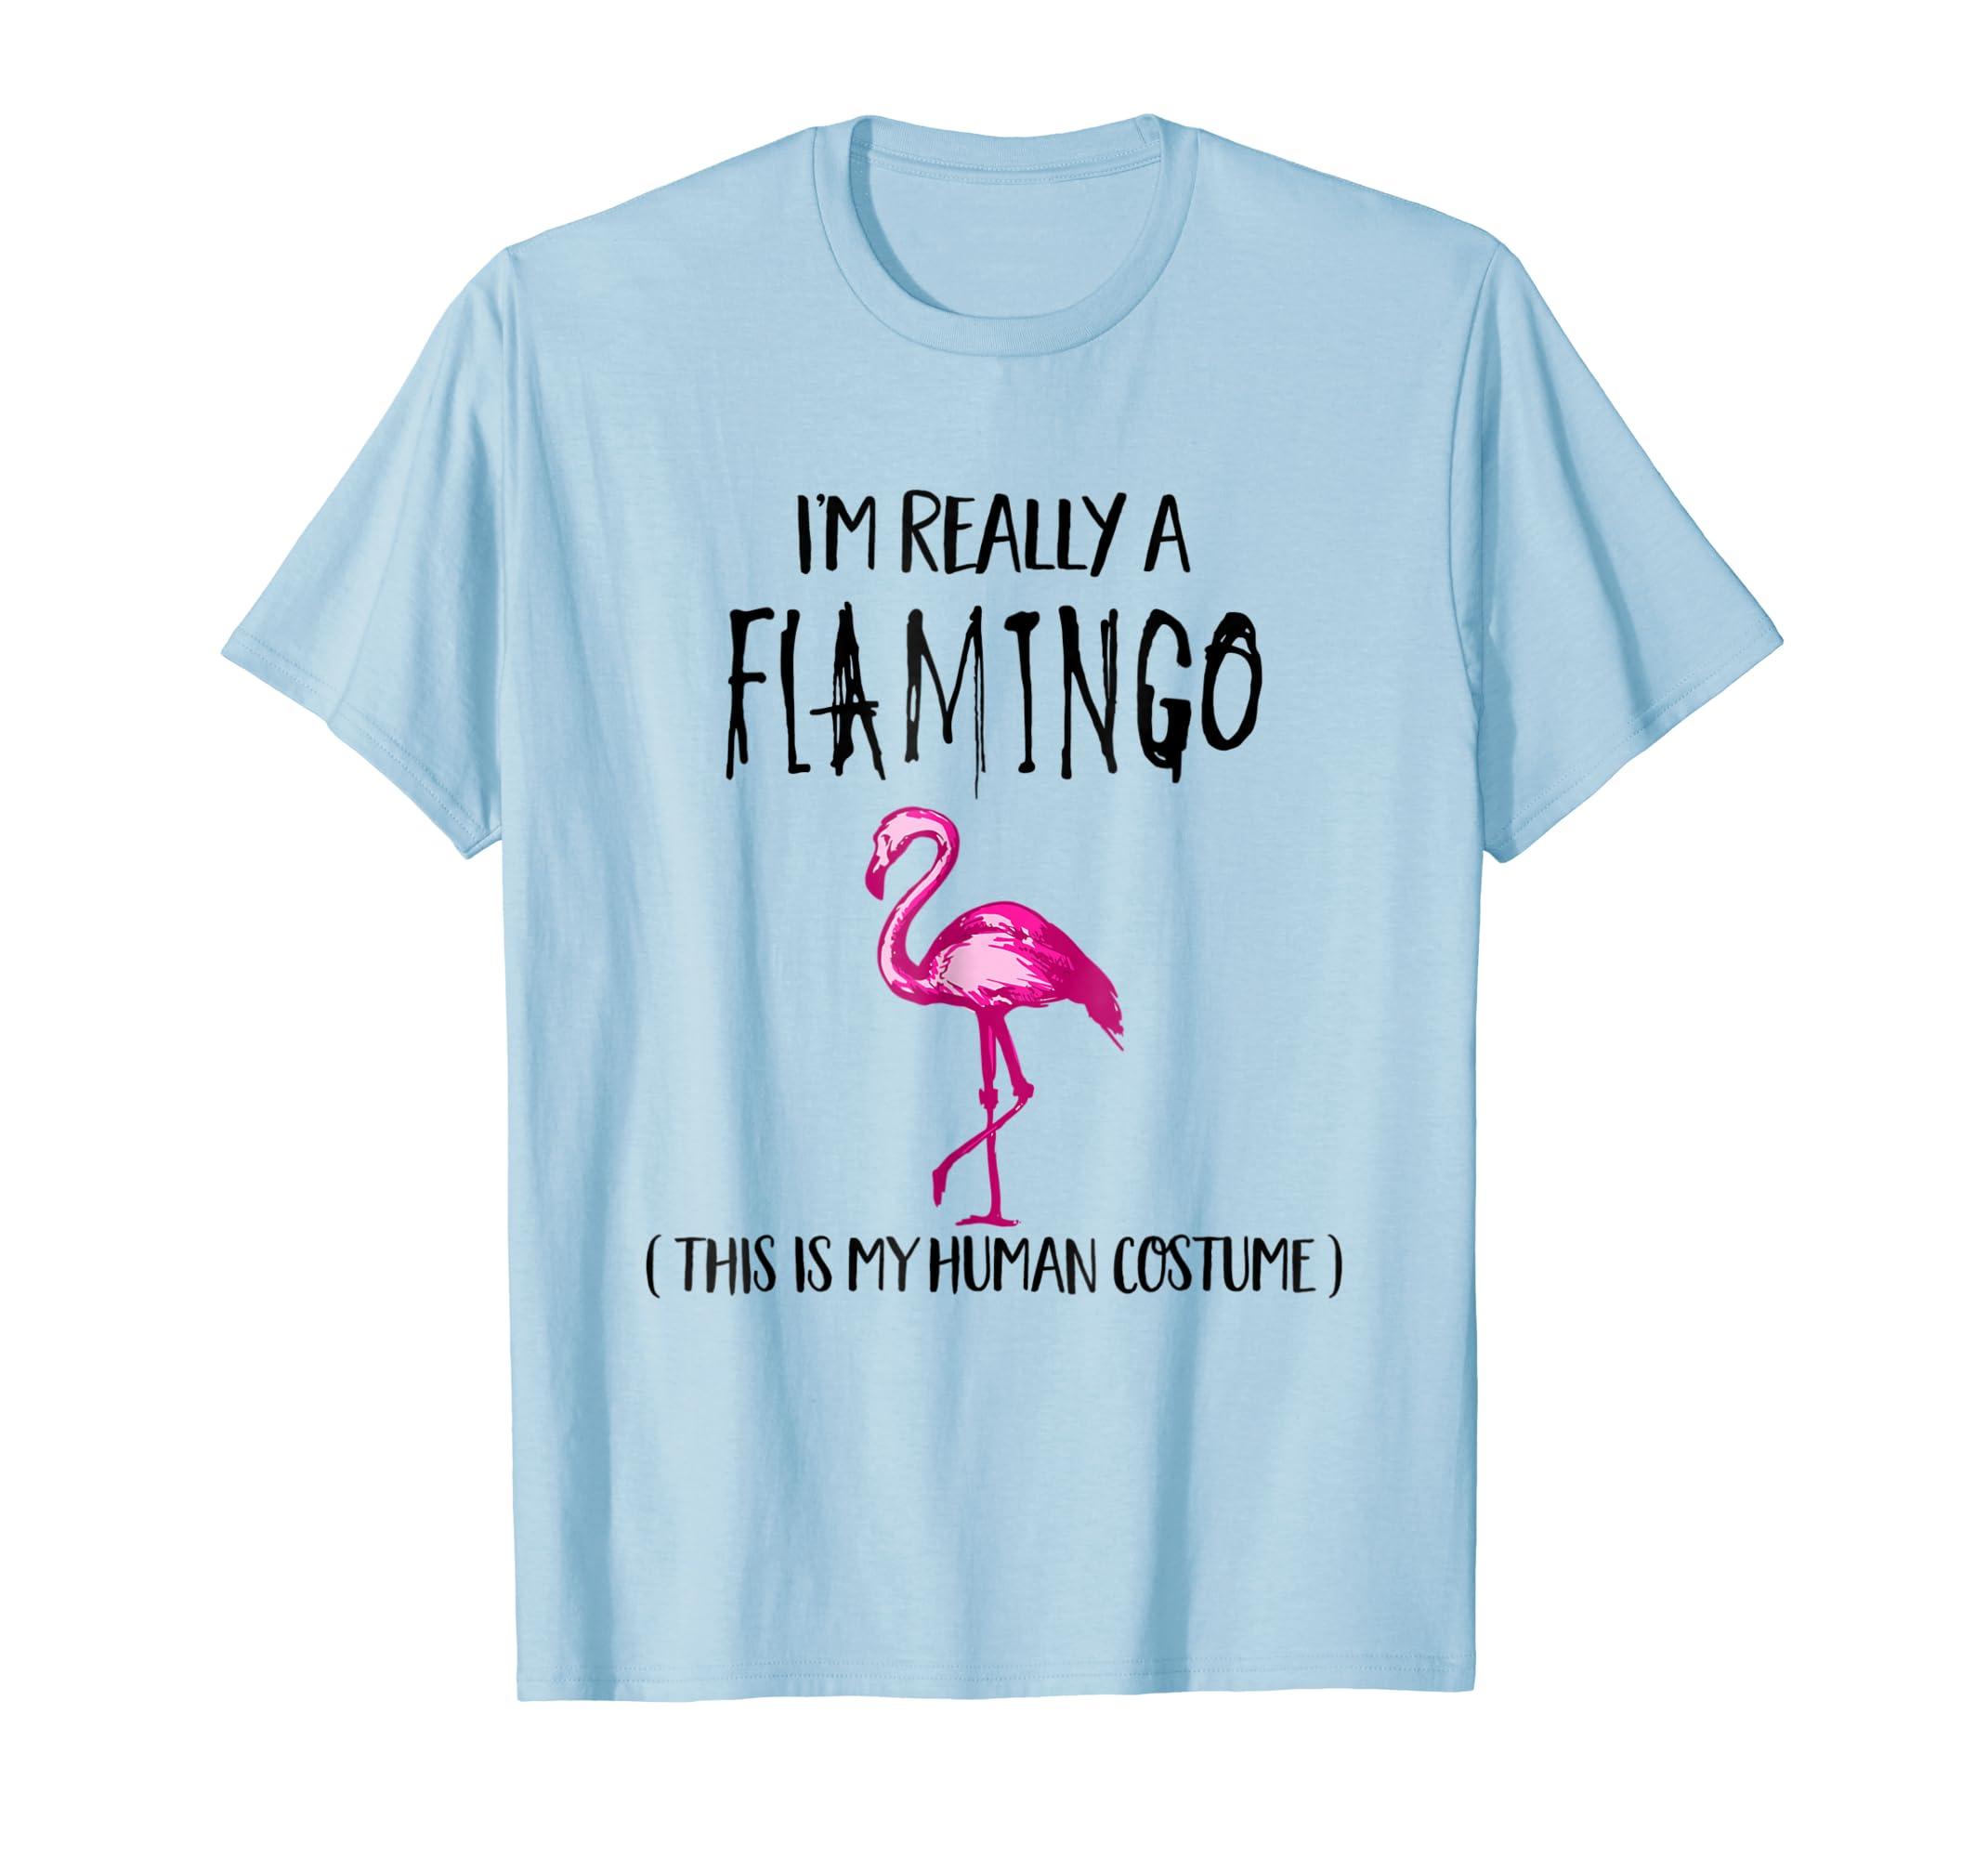 d90f91973533 This Is My Human Costume I'm Really A Flamingo T Shirt-Teechatpro –  Teechatpro.com